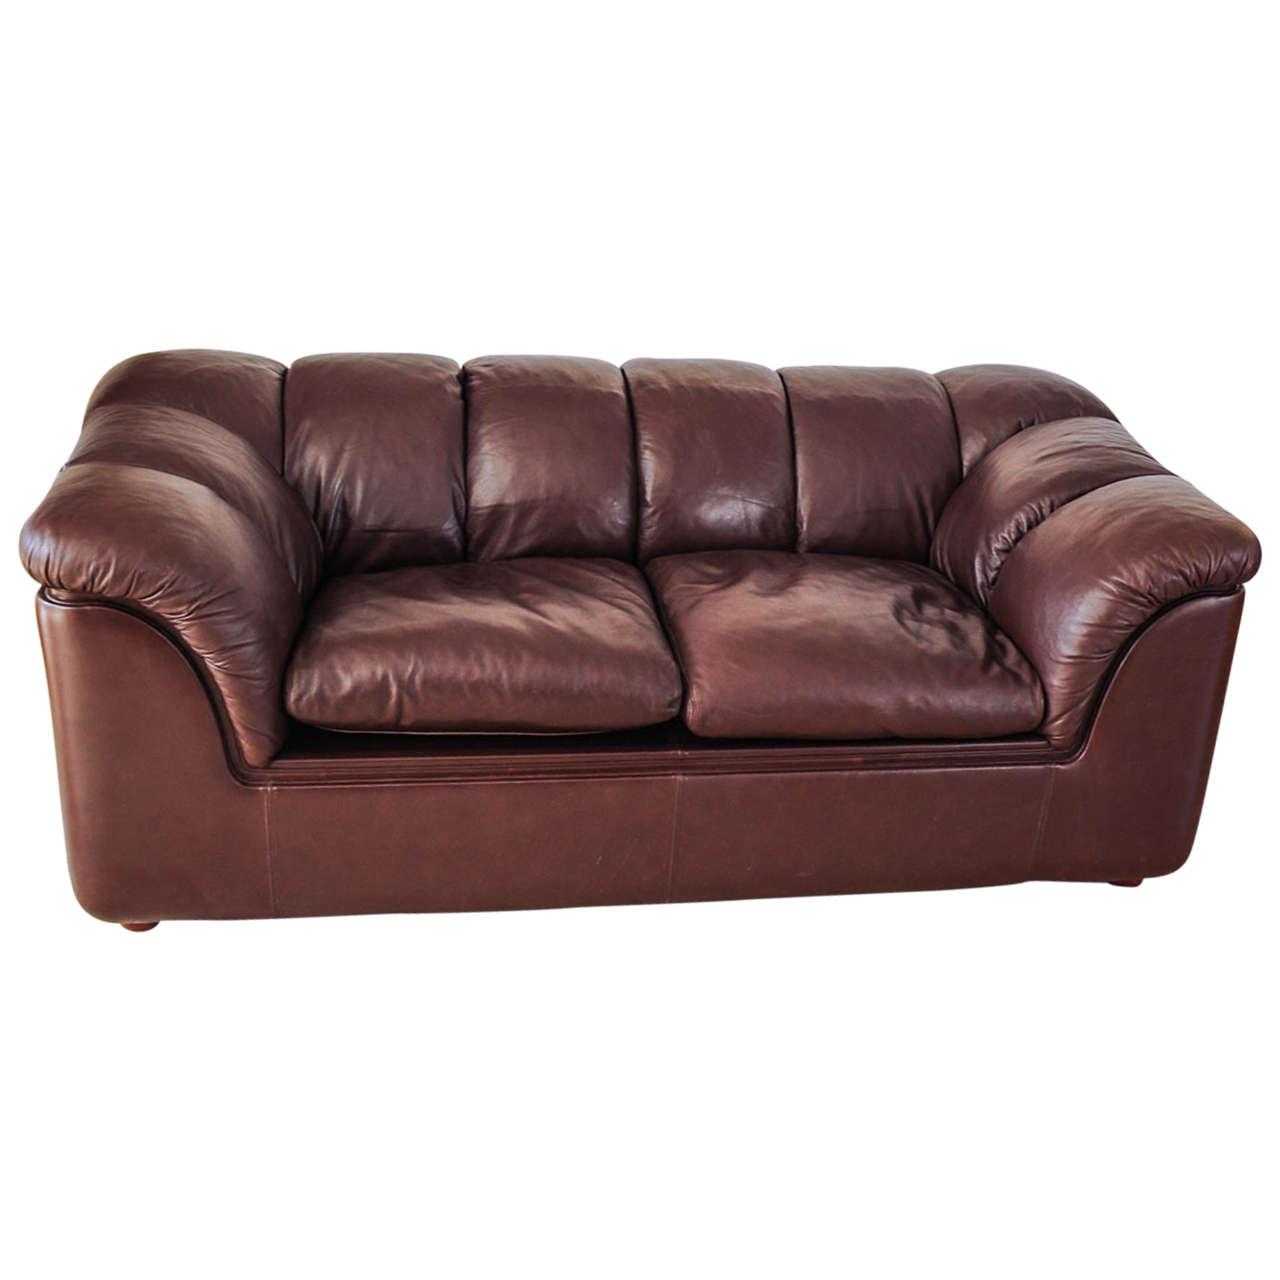 Leather sofa by poltrona frau at 1stdibs - Leather Sofa By Poltrona Frau 1